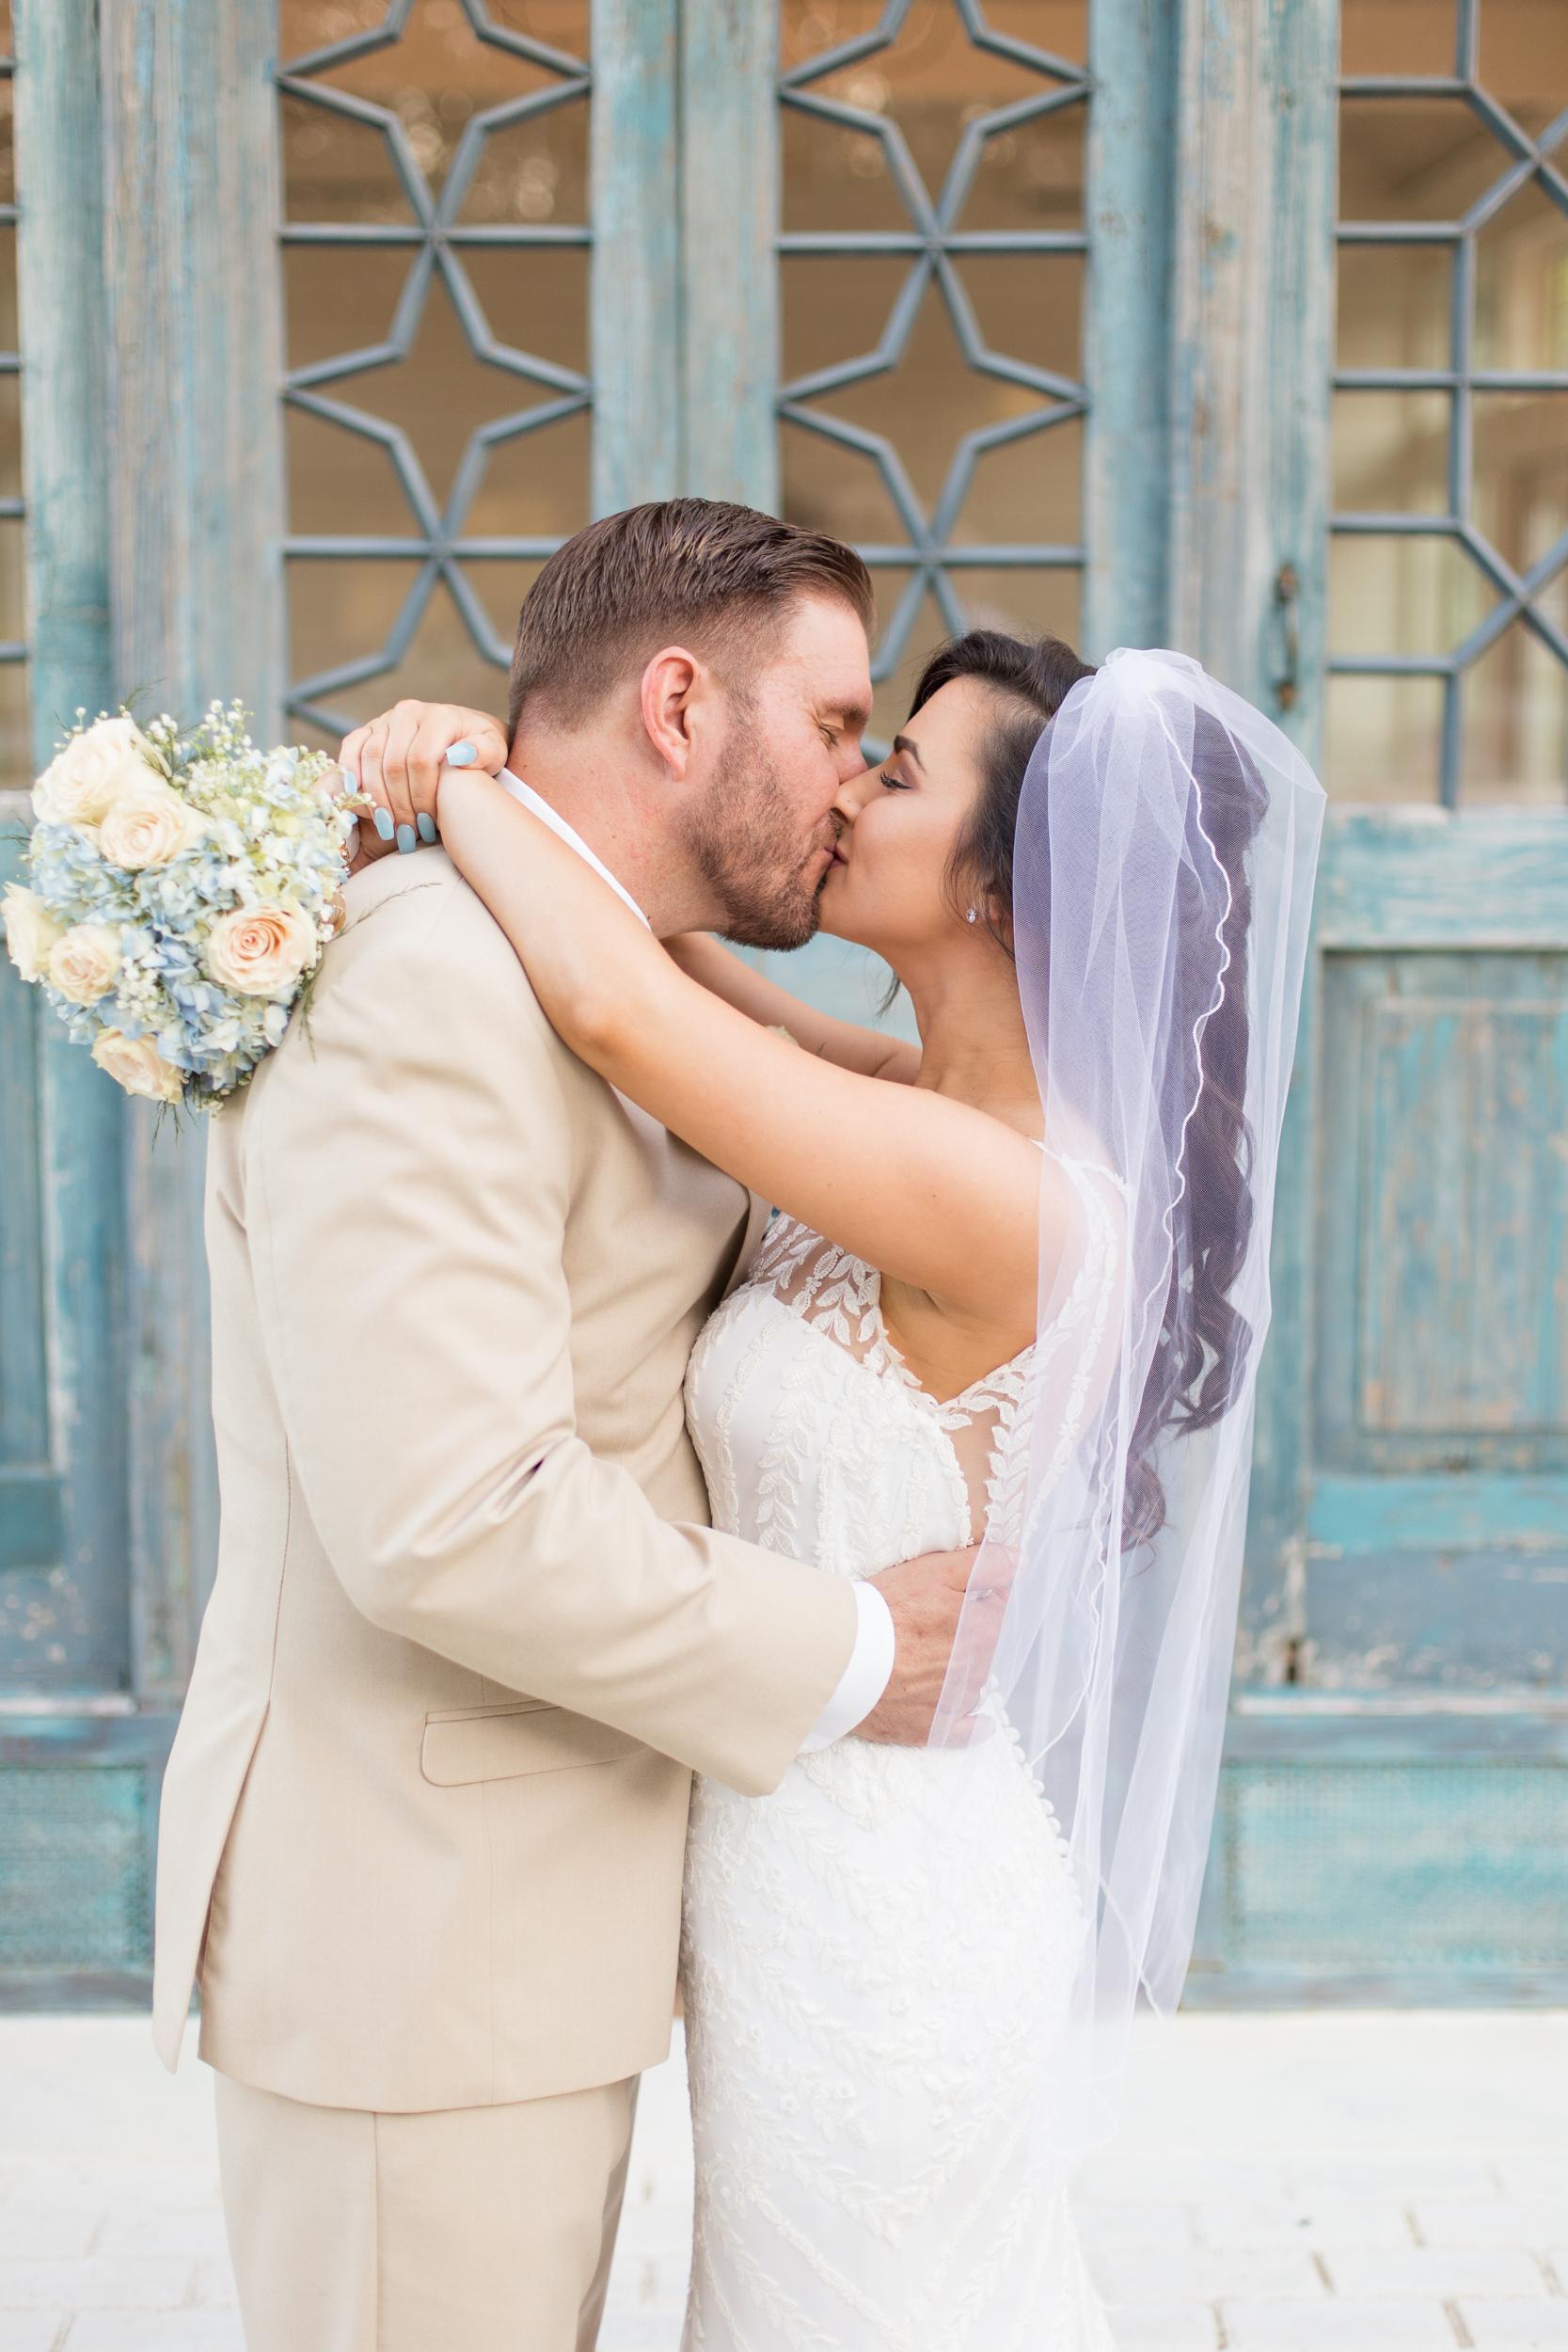 Zihlman-East TX Wedding_Kelsie Hendricks Photography_The Folmar Tyler Texas-120.jpg